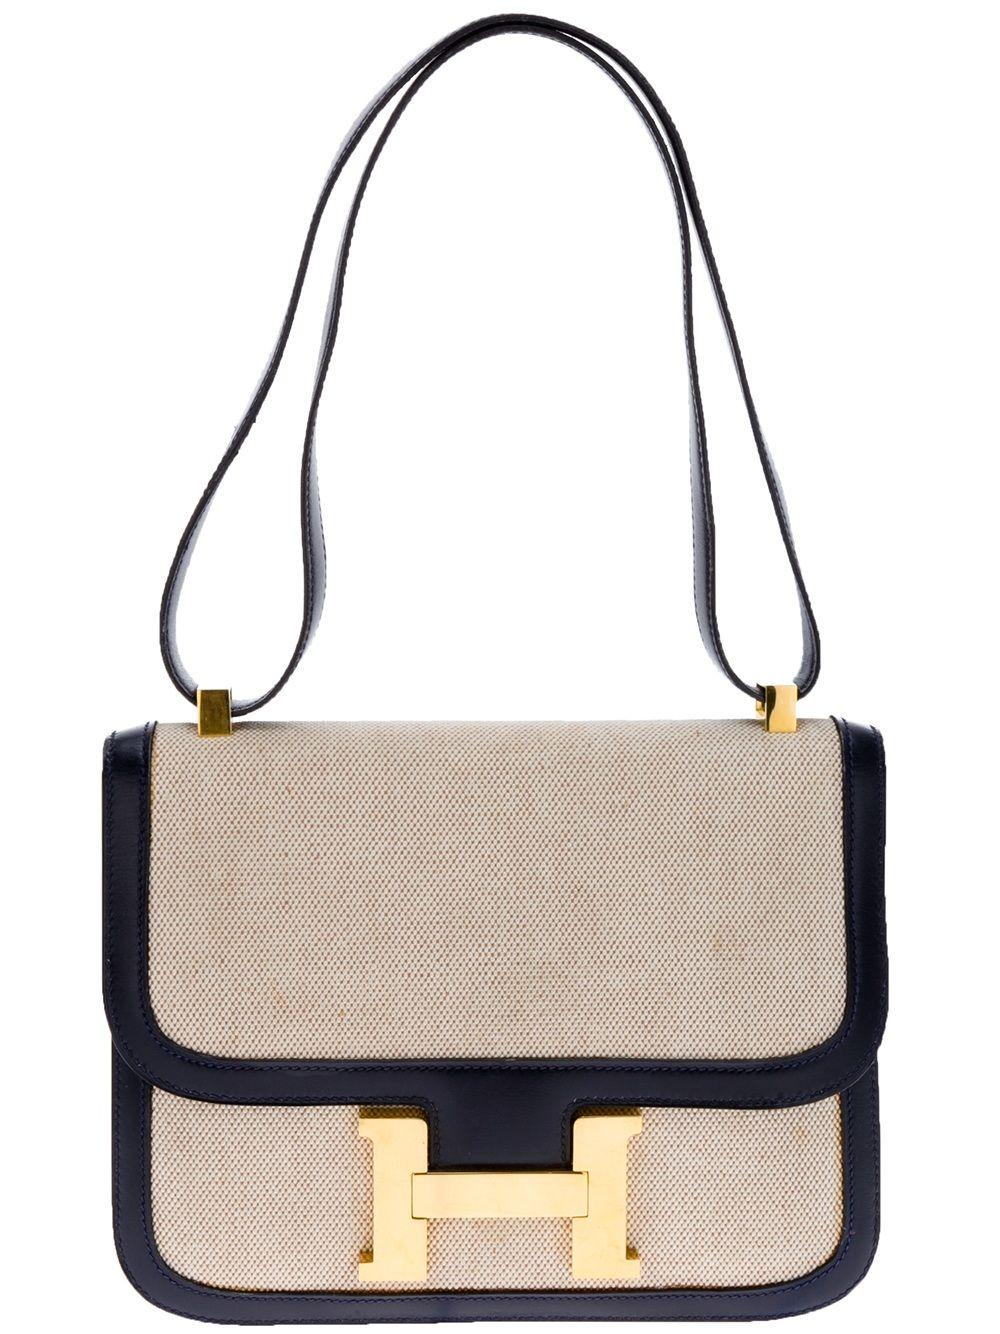 677ce2a71261 Hermès Vintage  Constance  Handbag - Katheleys - farfetch.com ...